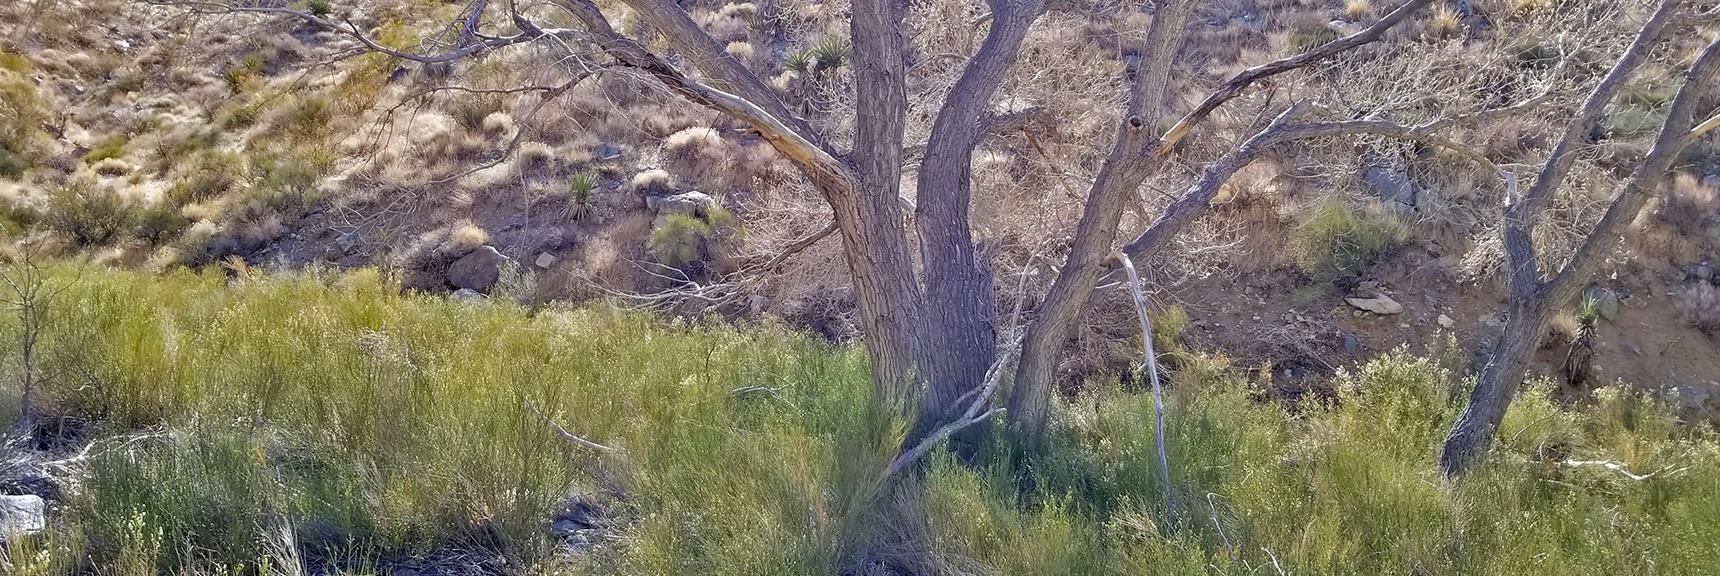 Horse Thief Canyon Springs Area | Mt Wilson, Black Mountains, Arizona, Lake Mead National Recreation Area